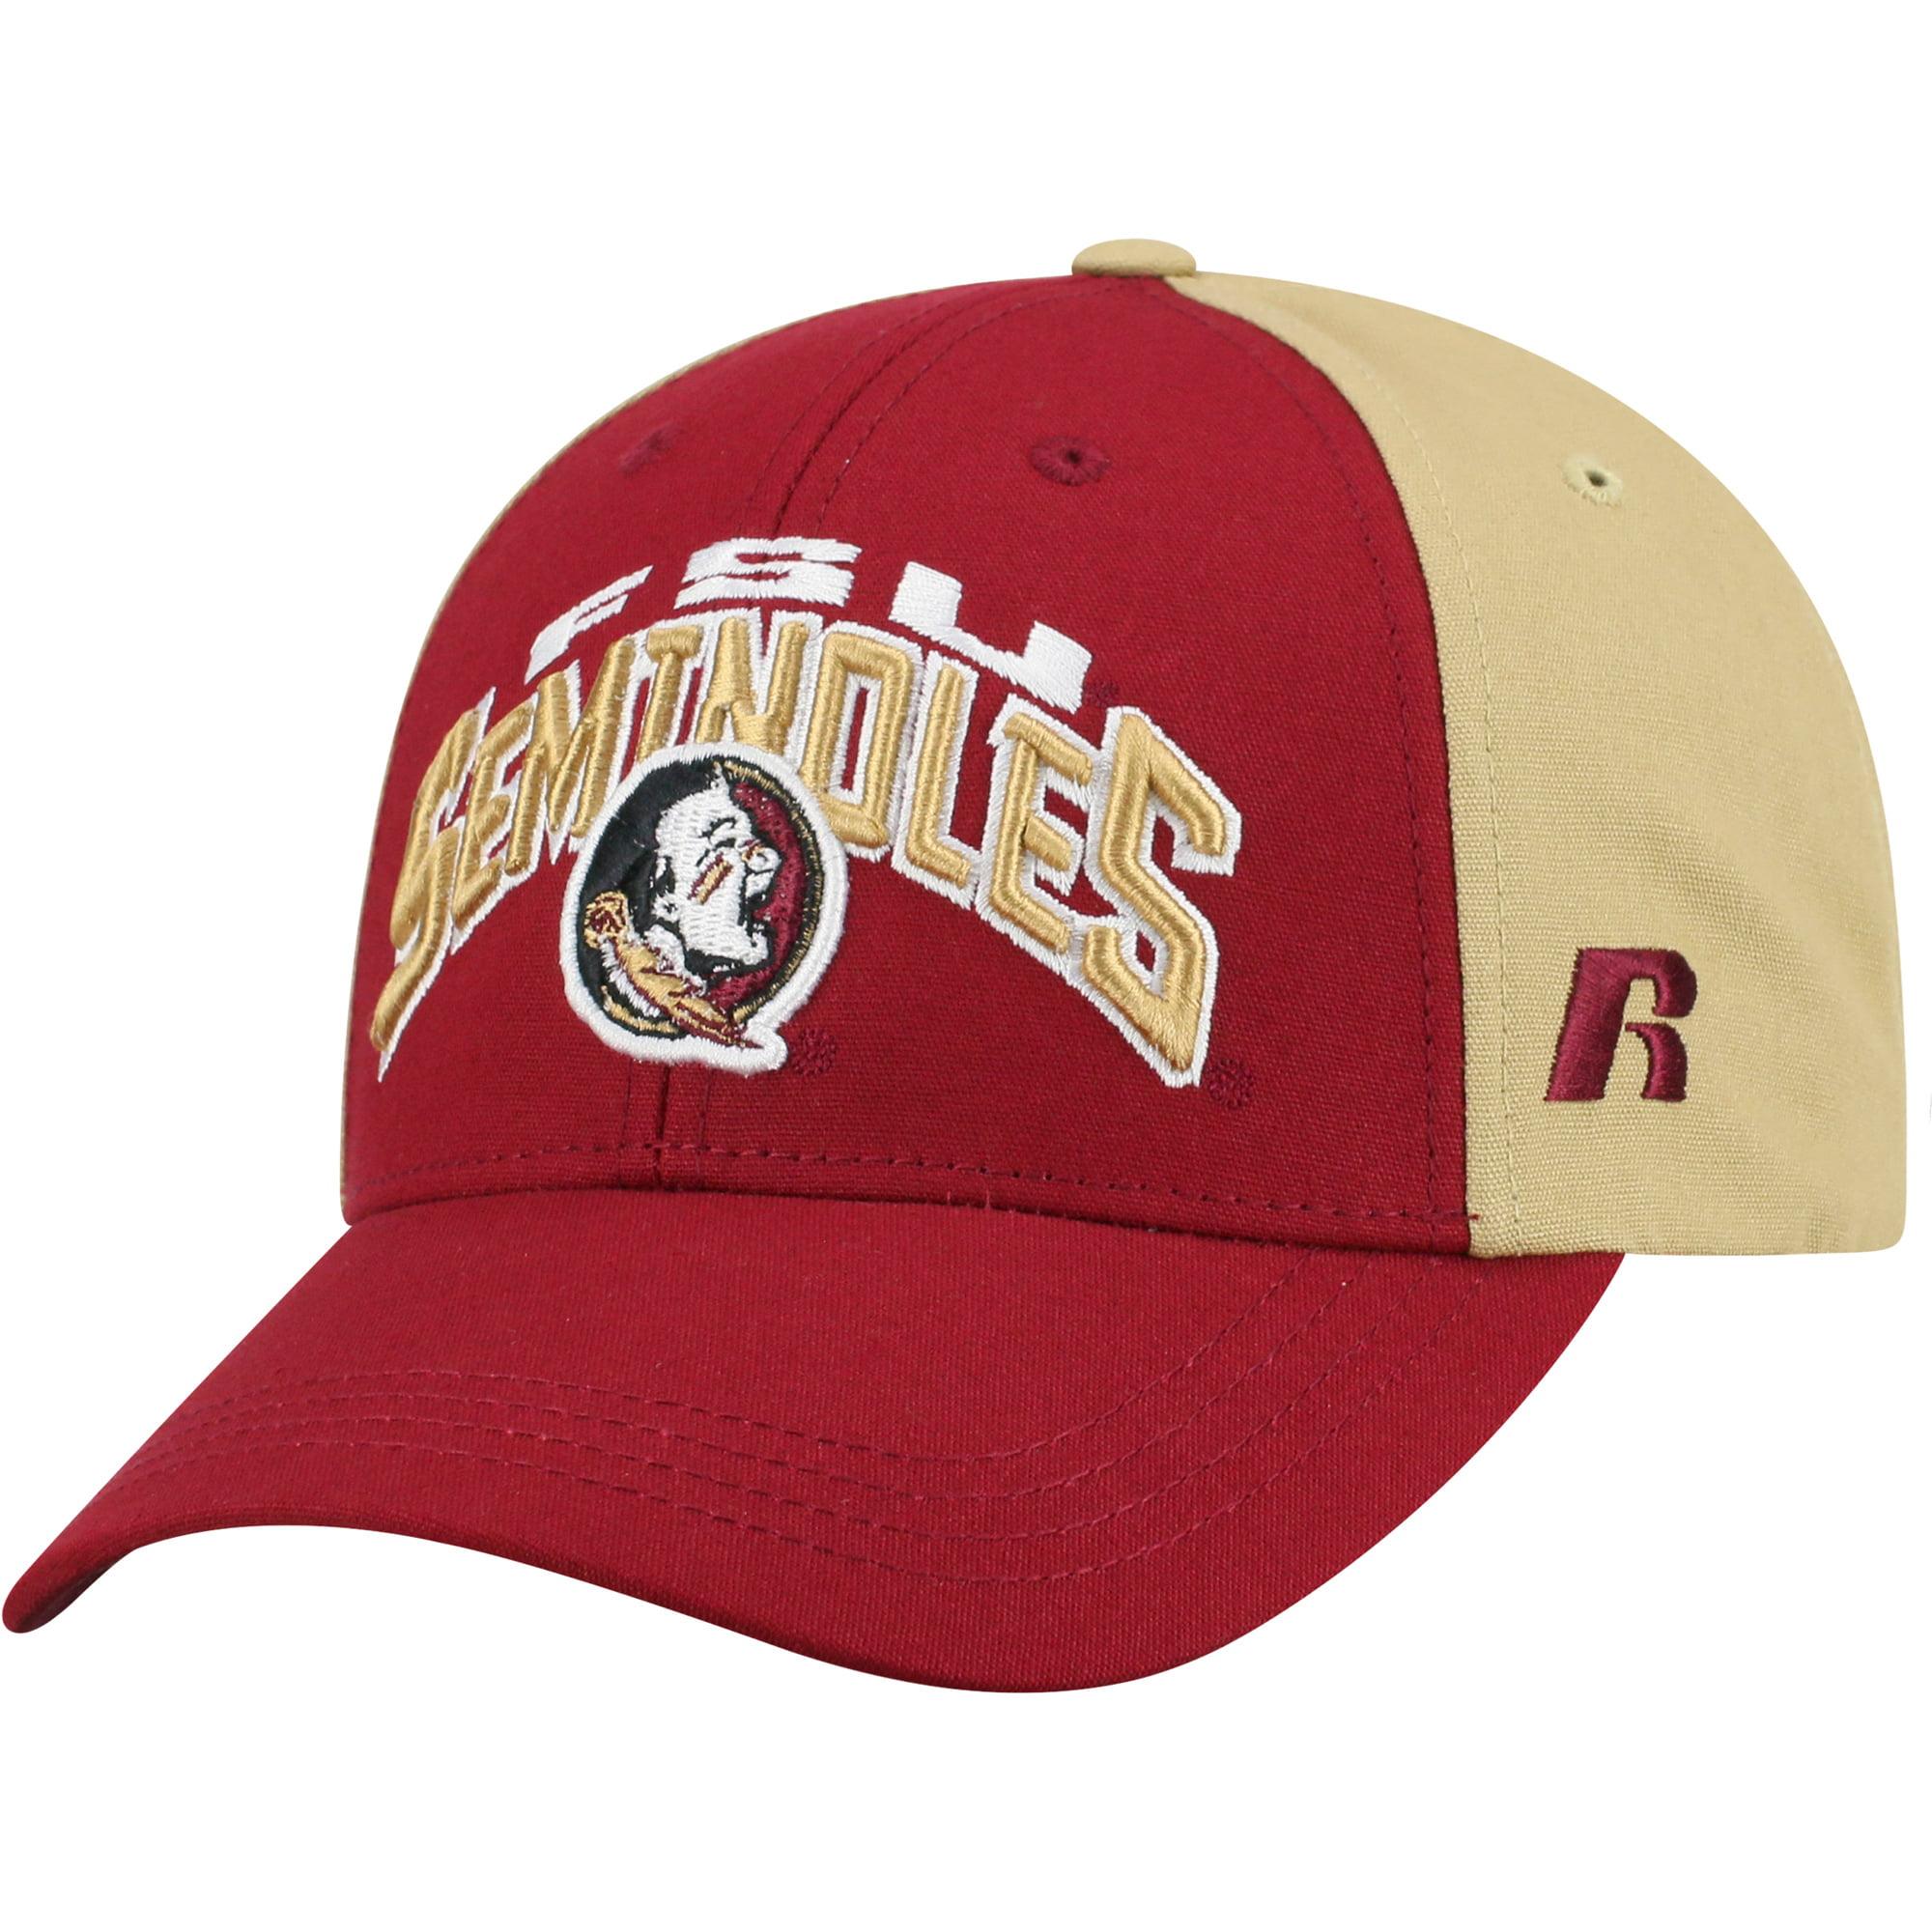 Men's Garnet/Gold Florida State Seminoles Tastic Adjustable Hat - OSFA